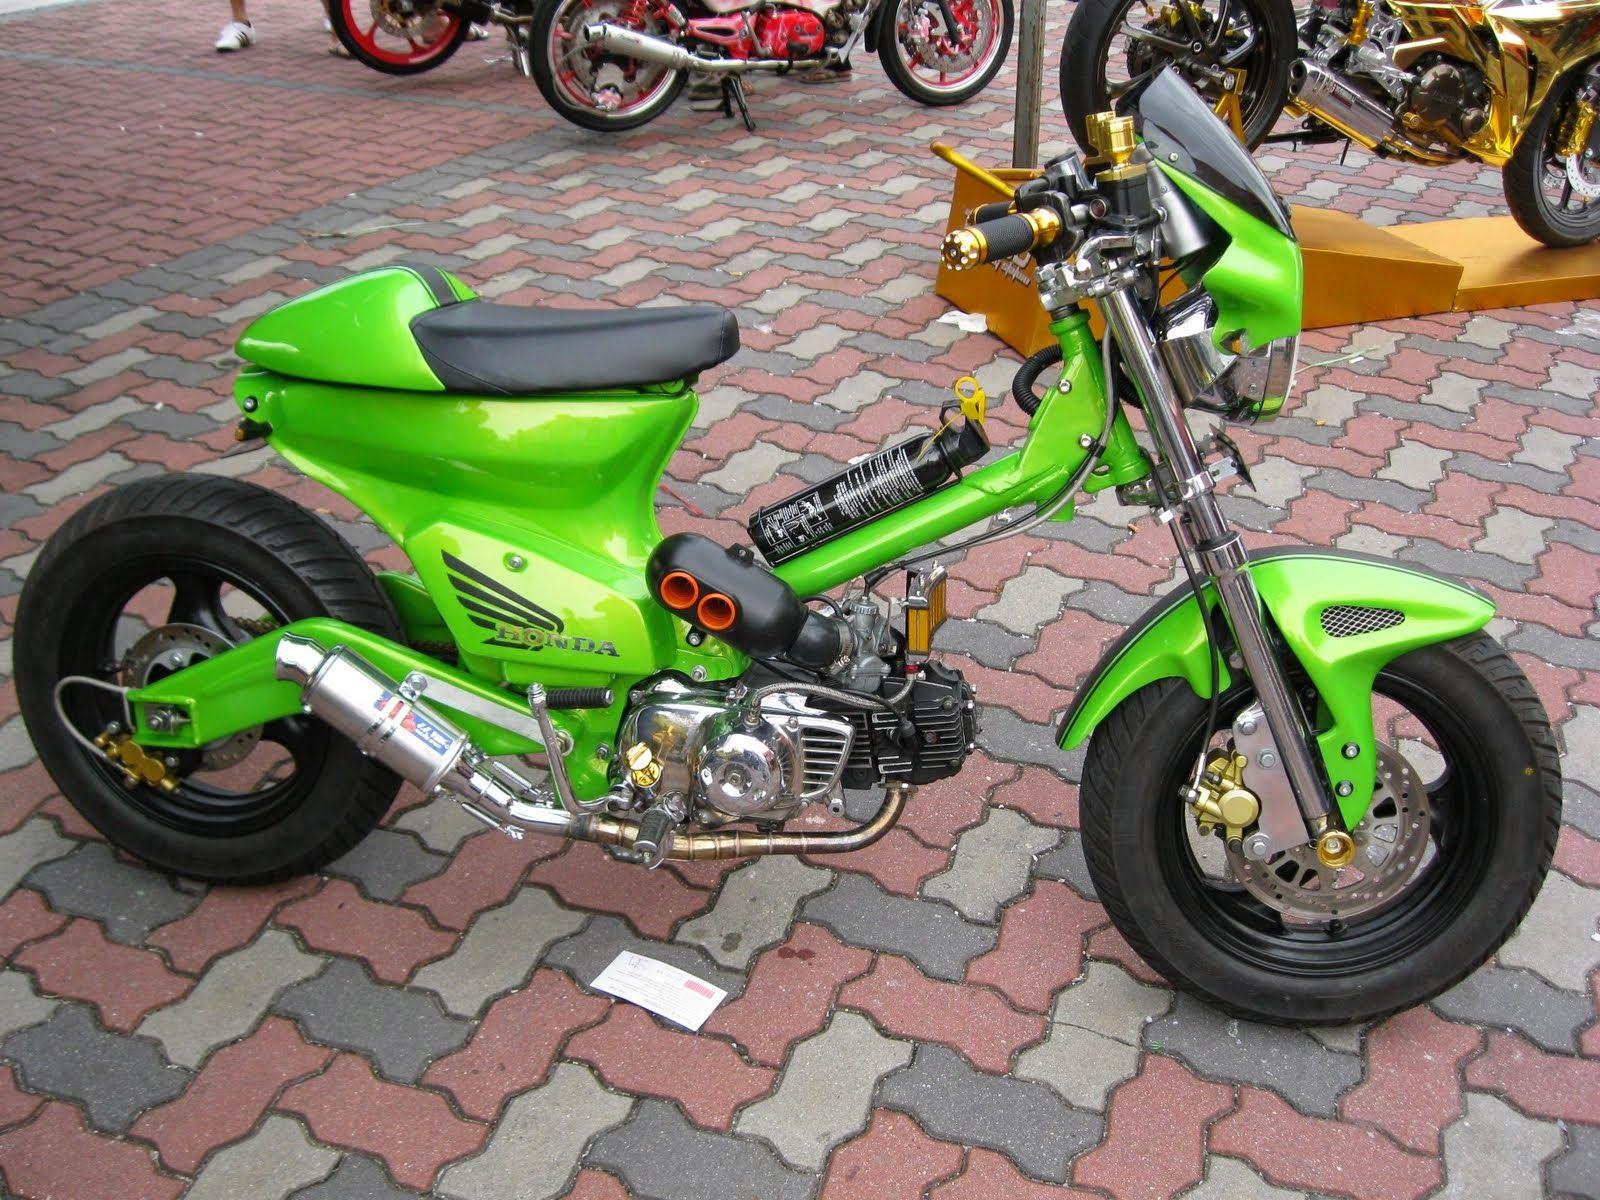 Modifikasi Motor Honda Cup 70jpg 16001200 Moto CC70 CC90